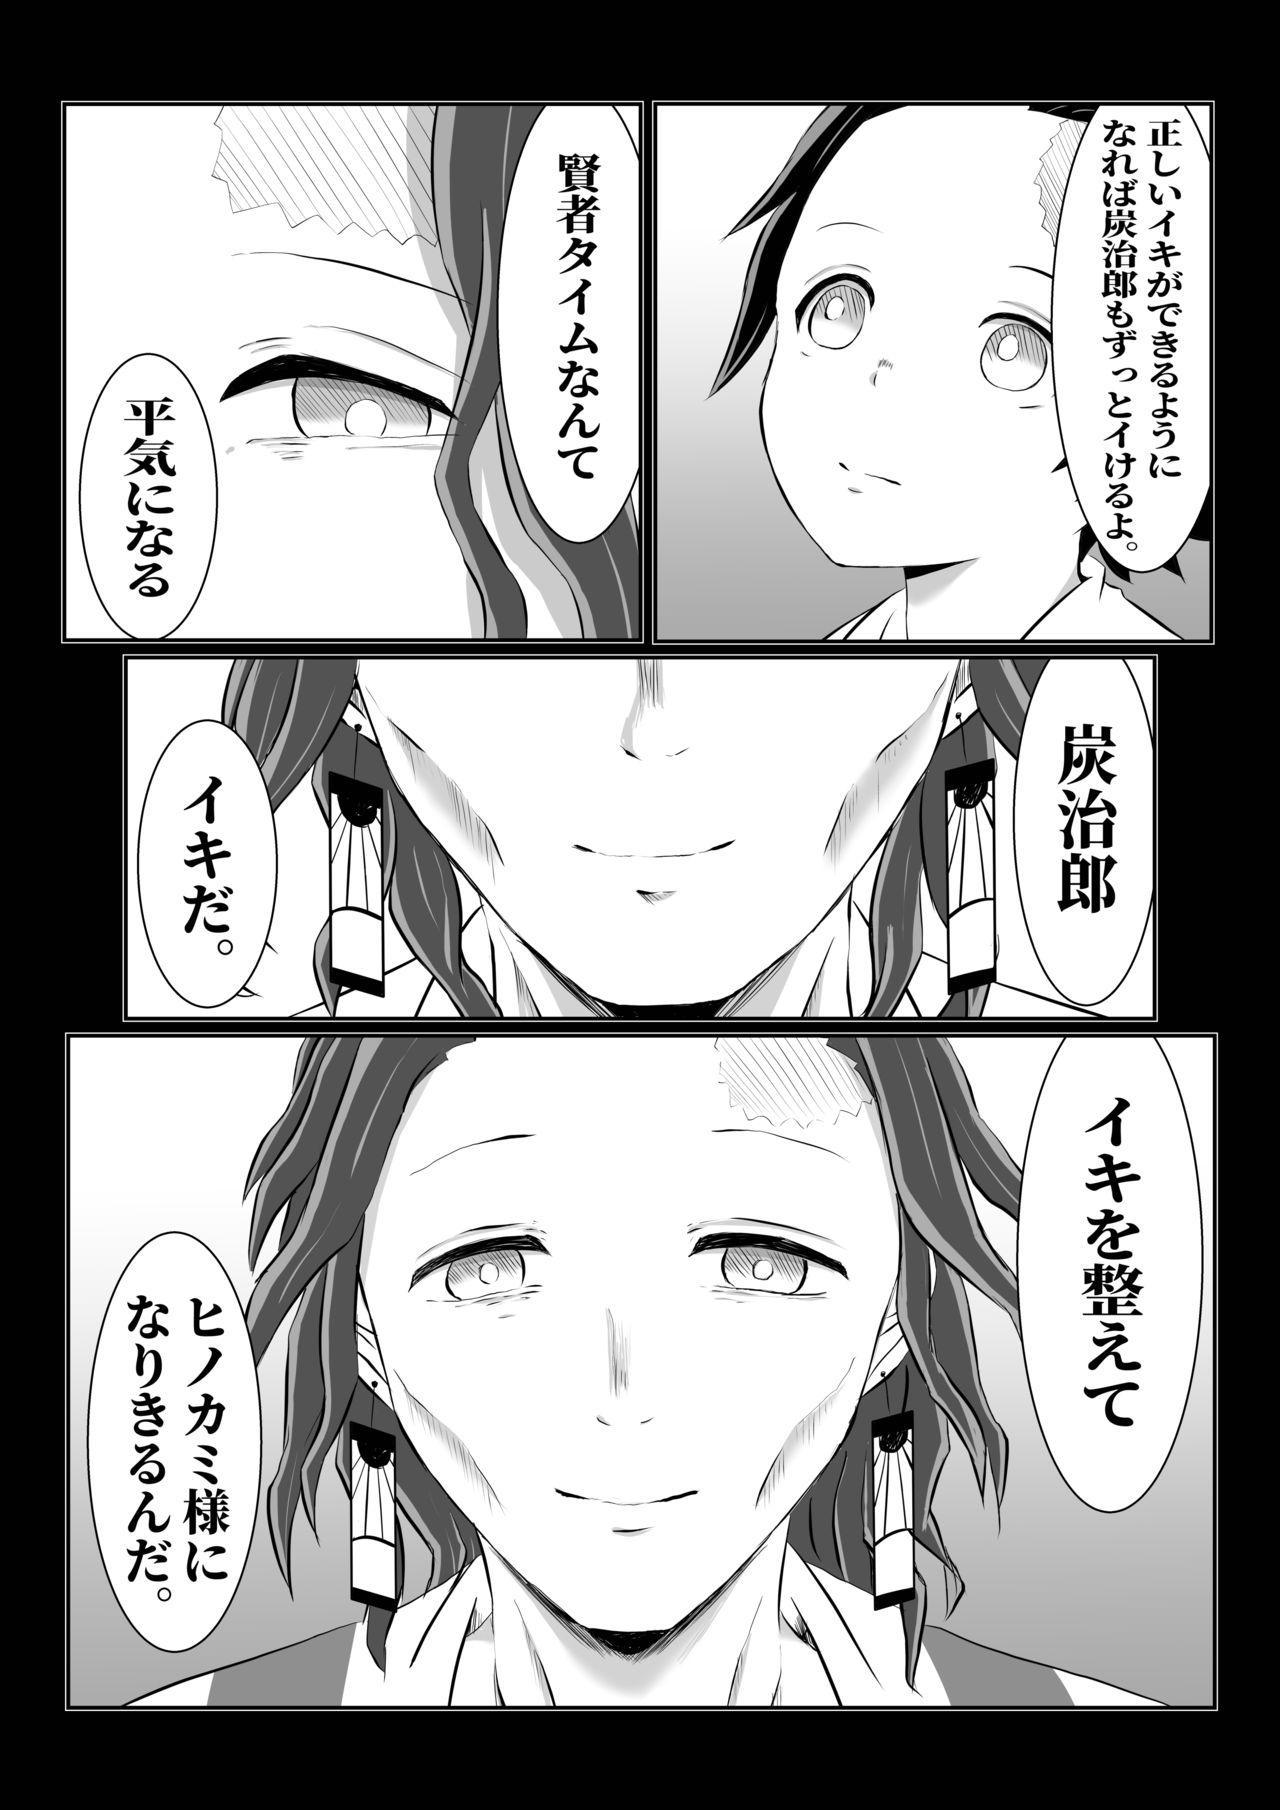 Hinokami Sex. 22